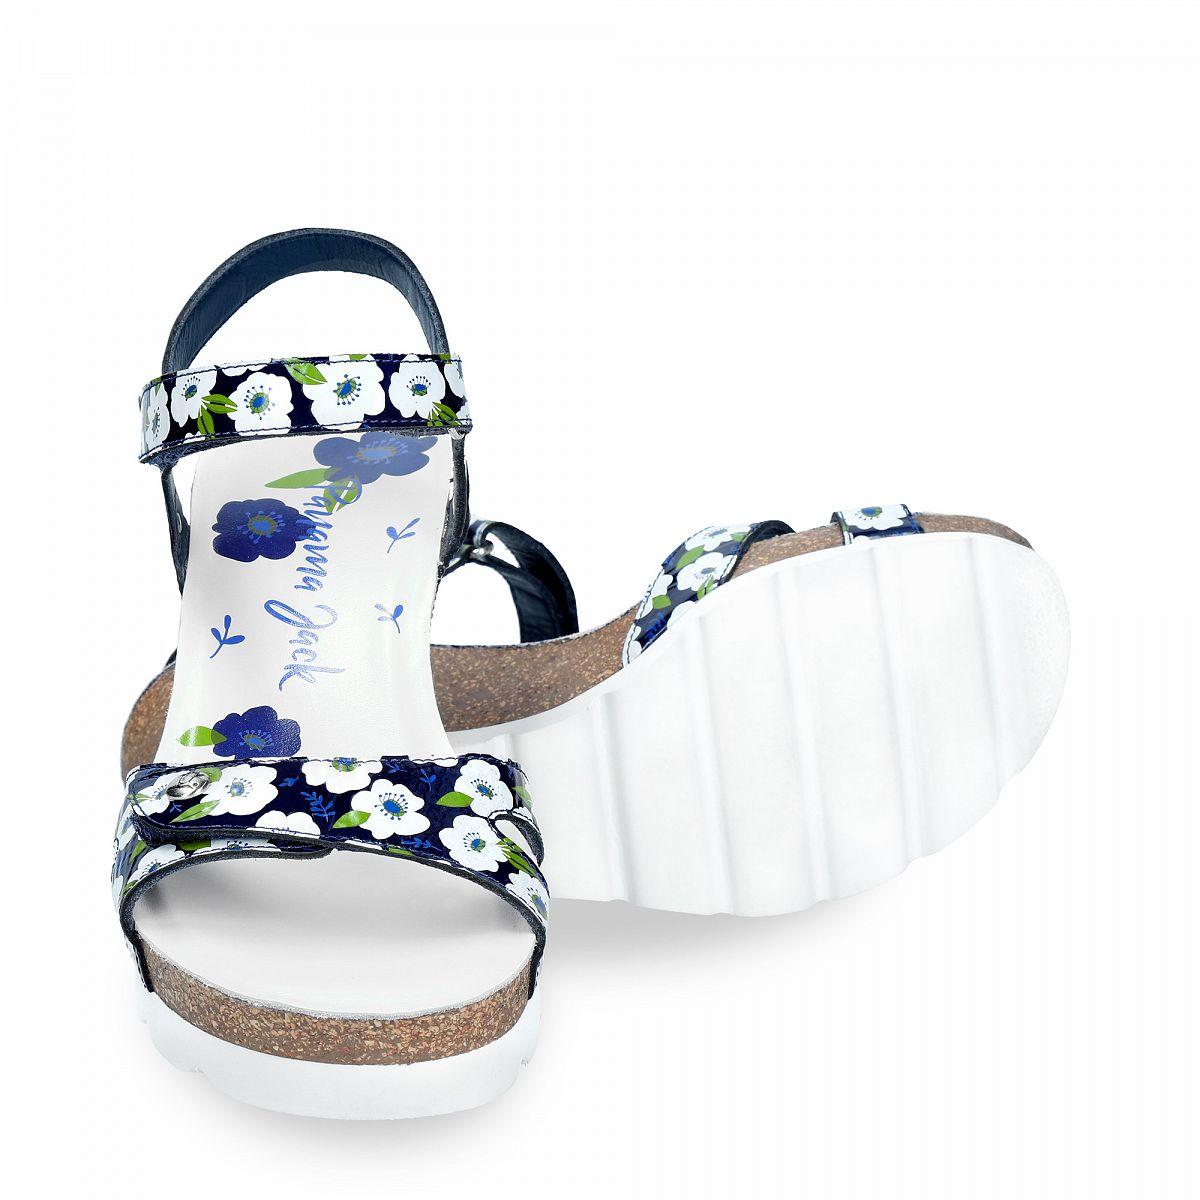 Julia Garden Navy blue Charol